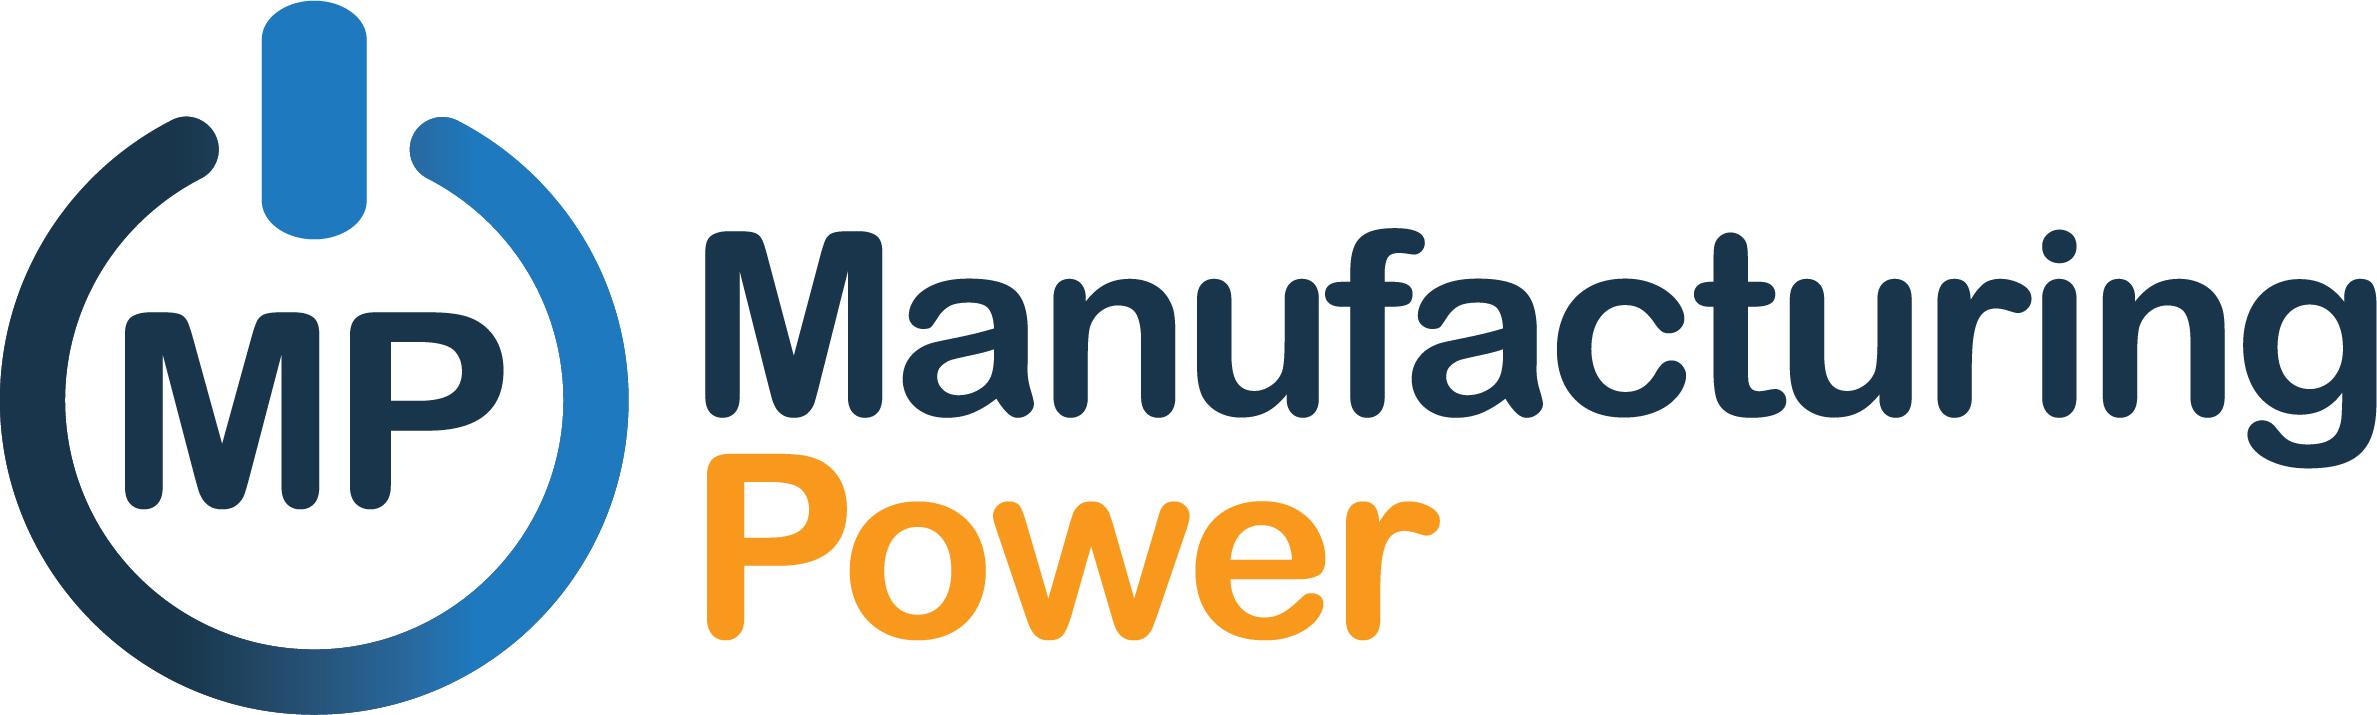 ManufacturingPower Profiled in IoTNow Magazine